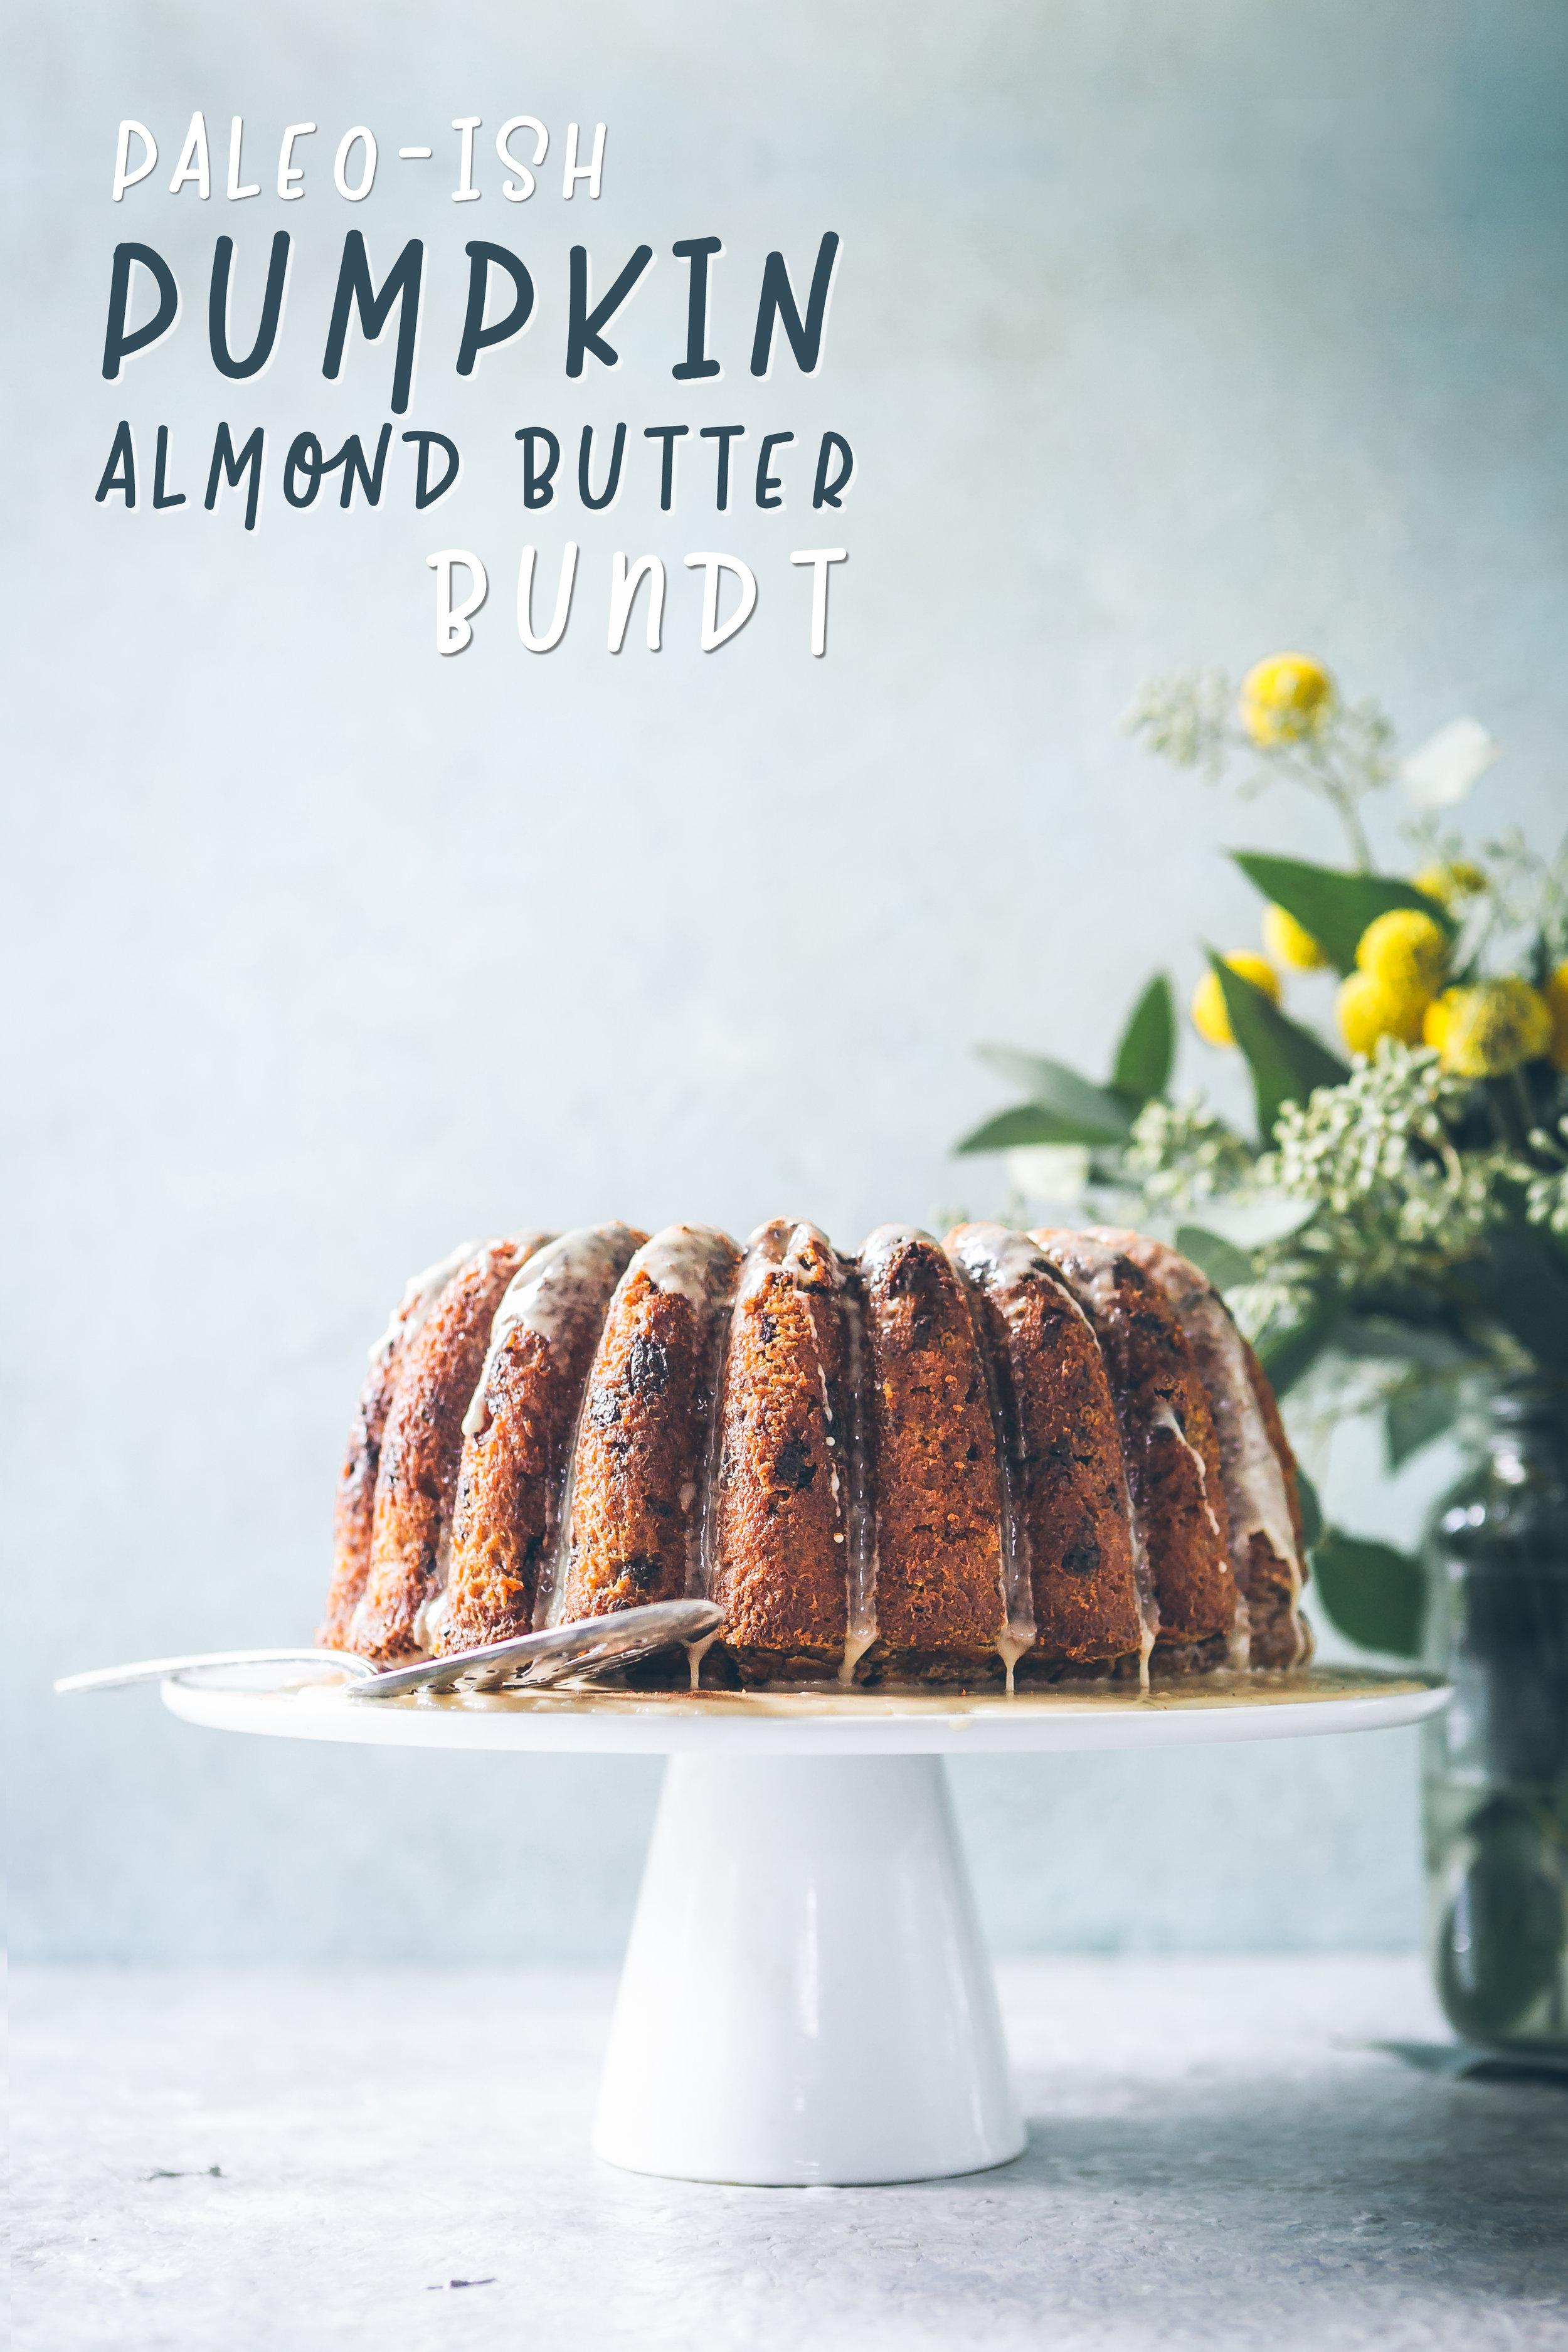 Paleo-ish Pumpkin Almond Butter Bundt HDR.jpg